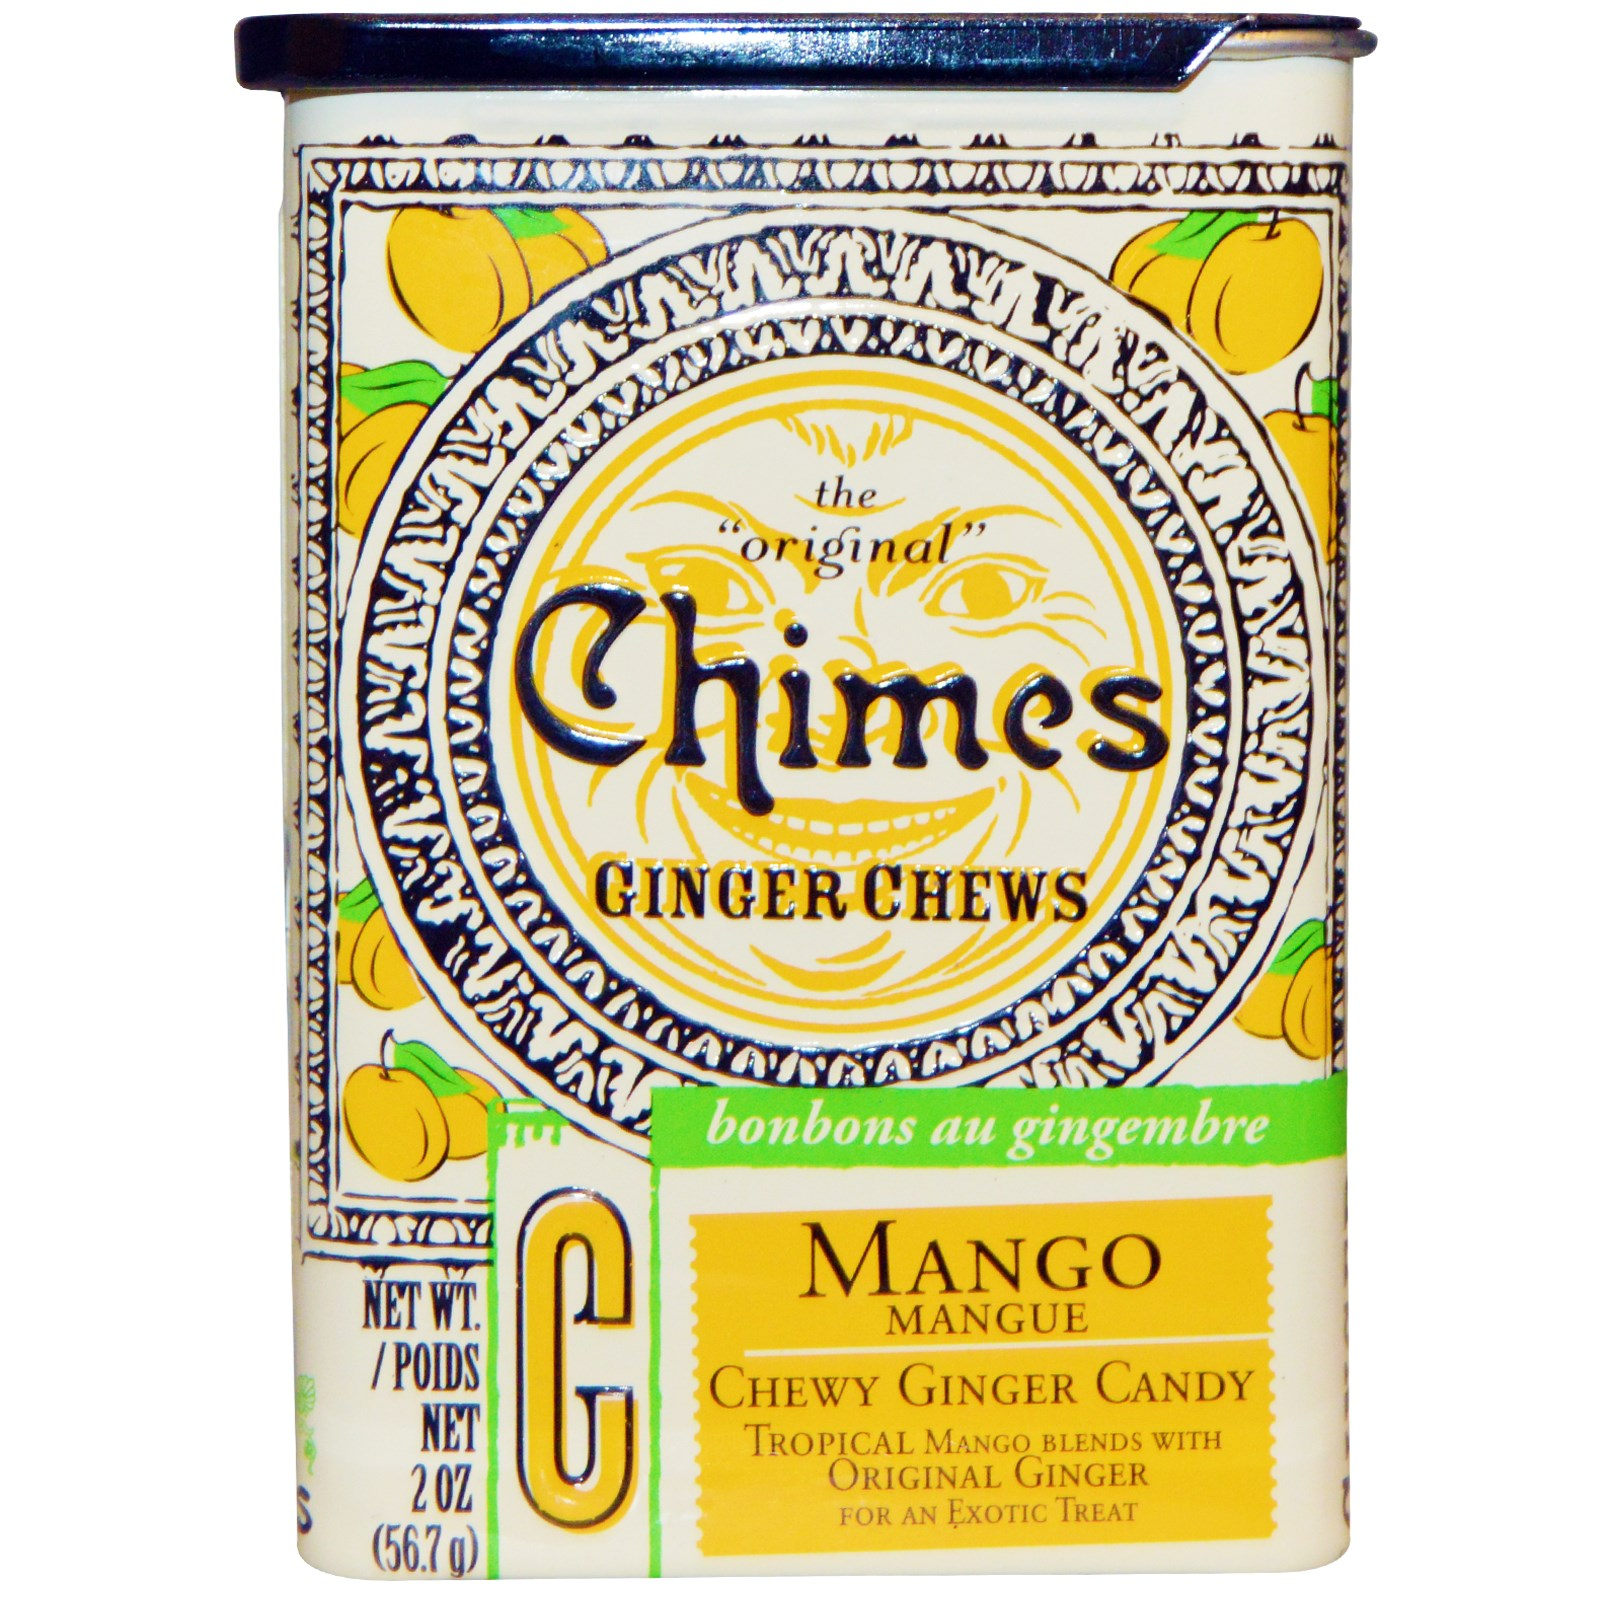 Chimes, Ginger Chews, Mango, 2 oz(pack of 12)